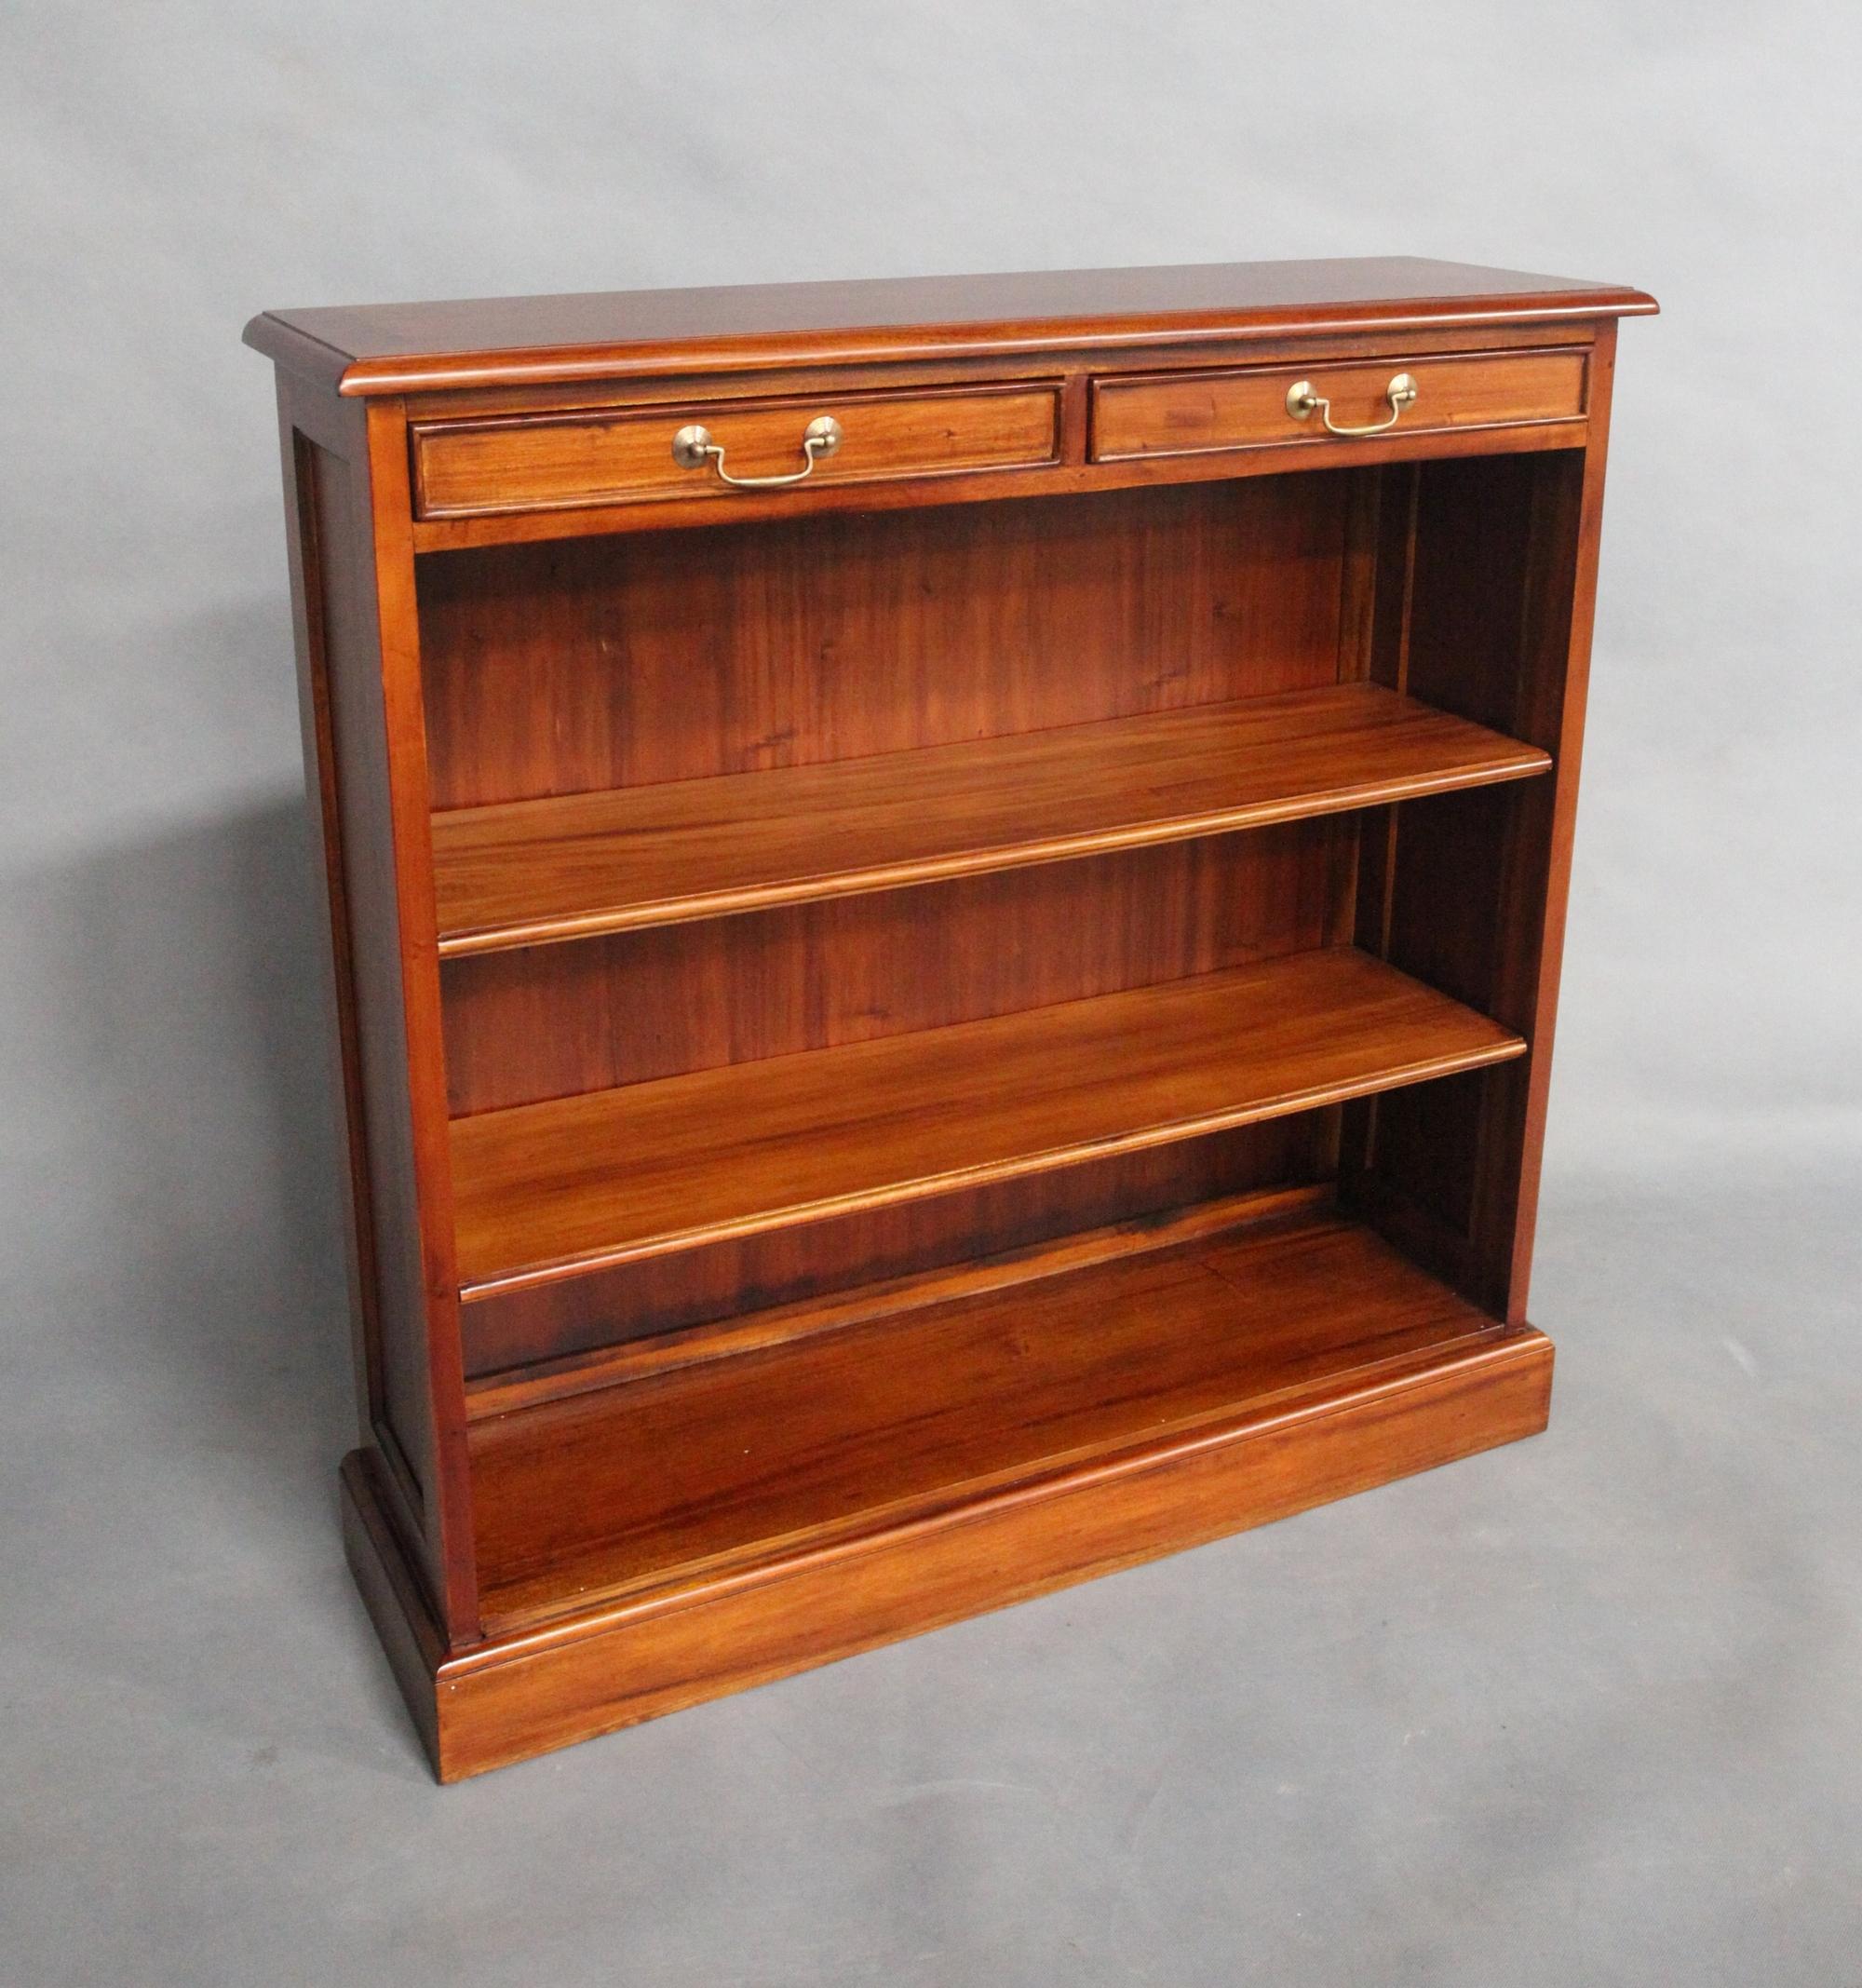 Solid Mahogany Wood 2 Drawers Low Bookshelf Pre Order